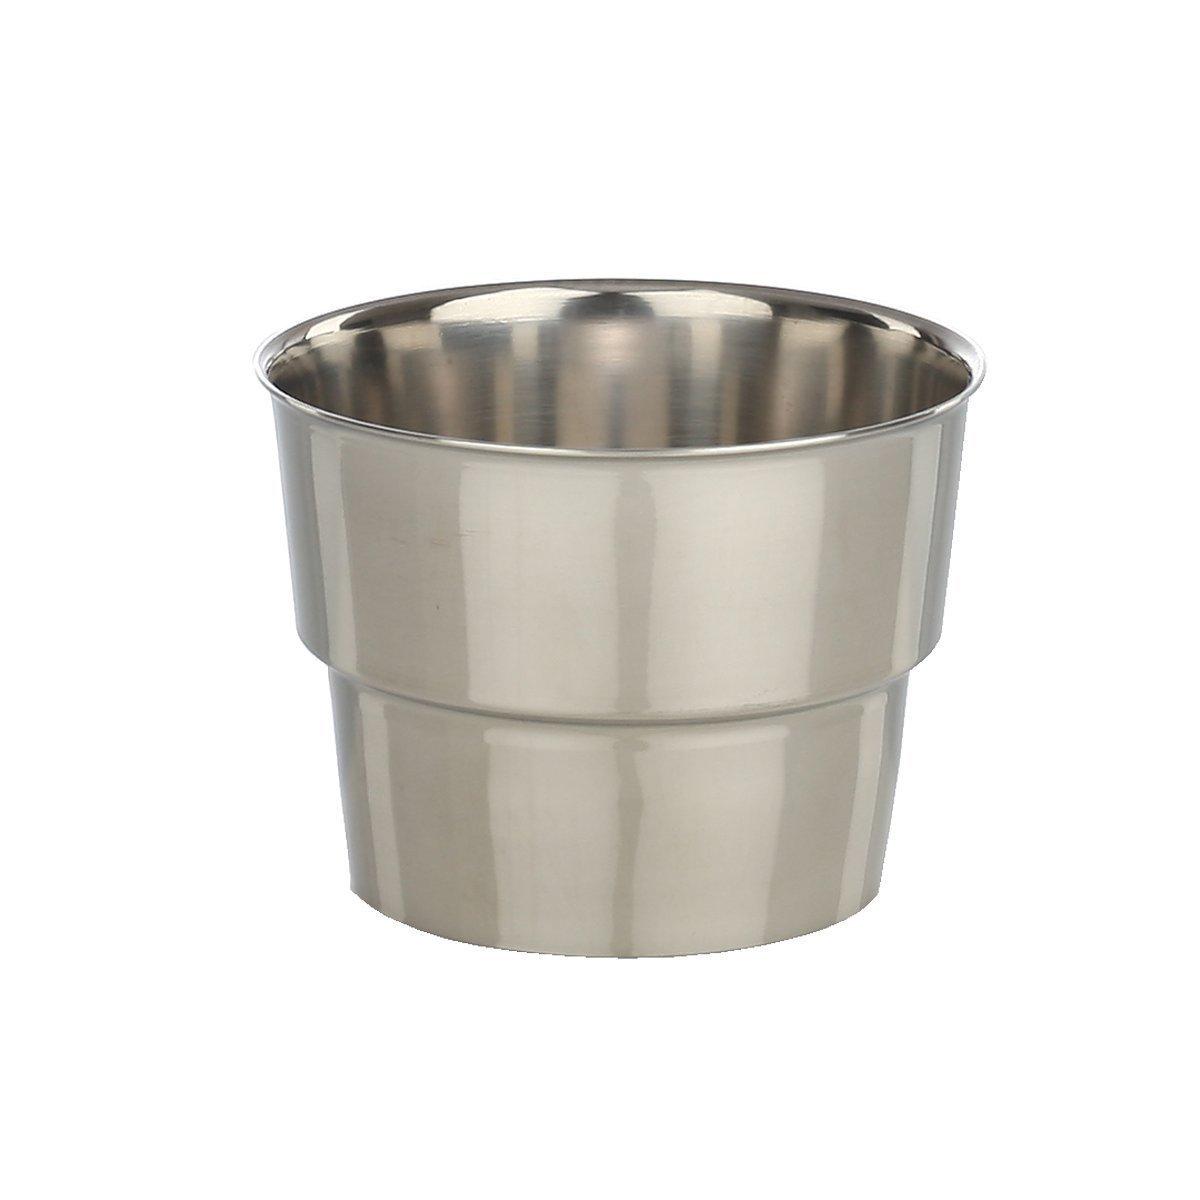 Libertyware Stainless Steel Milkshake Collar (04-0478) Category: Bar Shakers